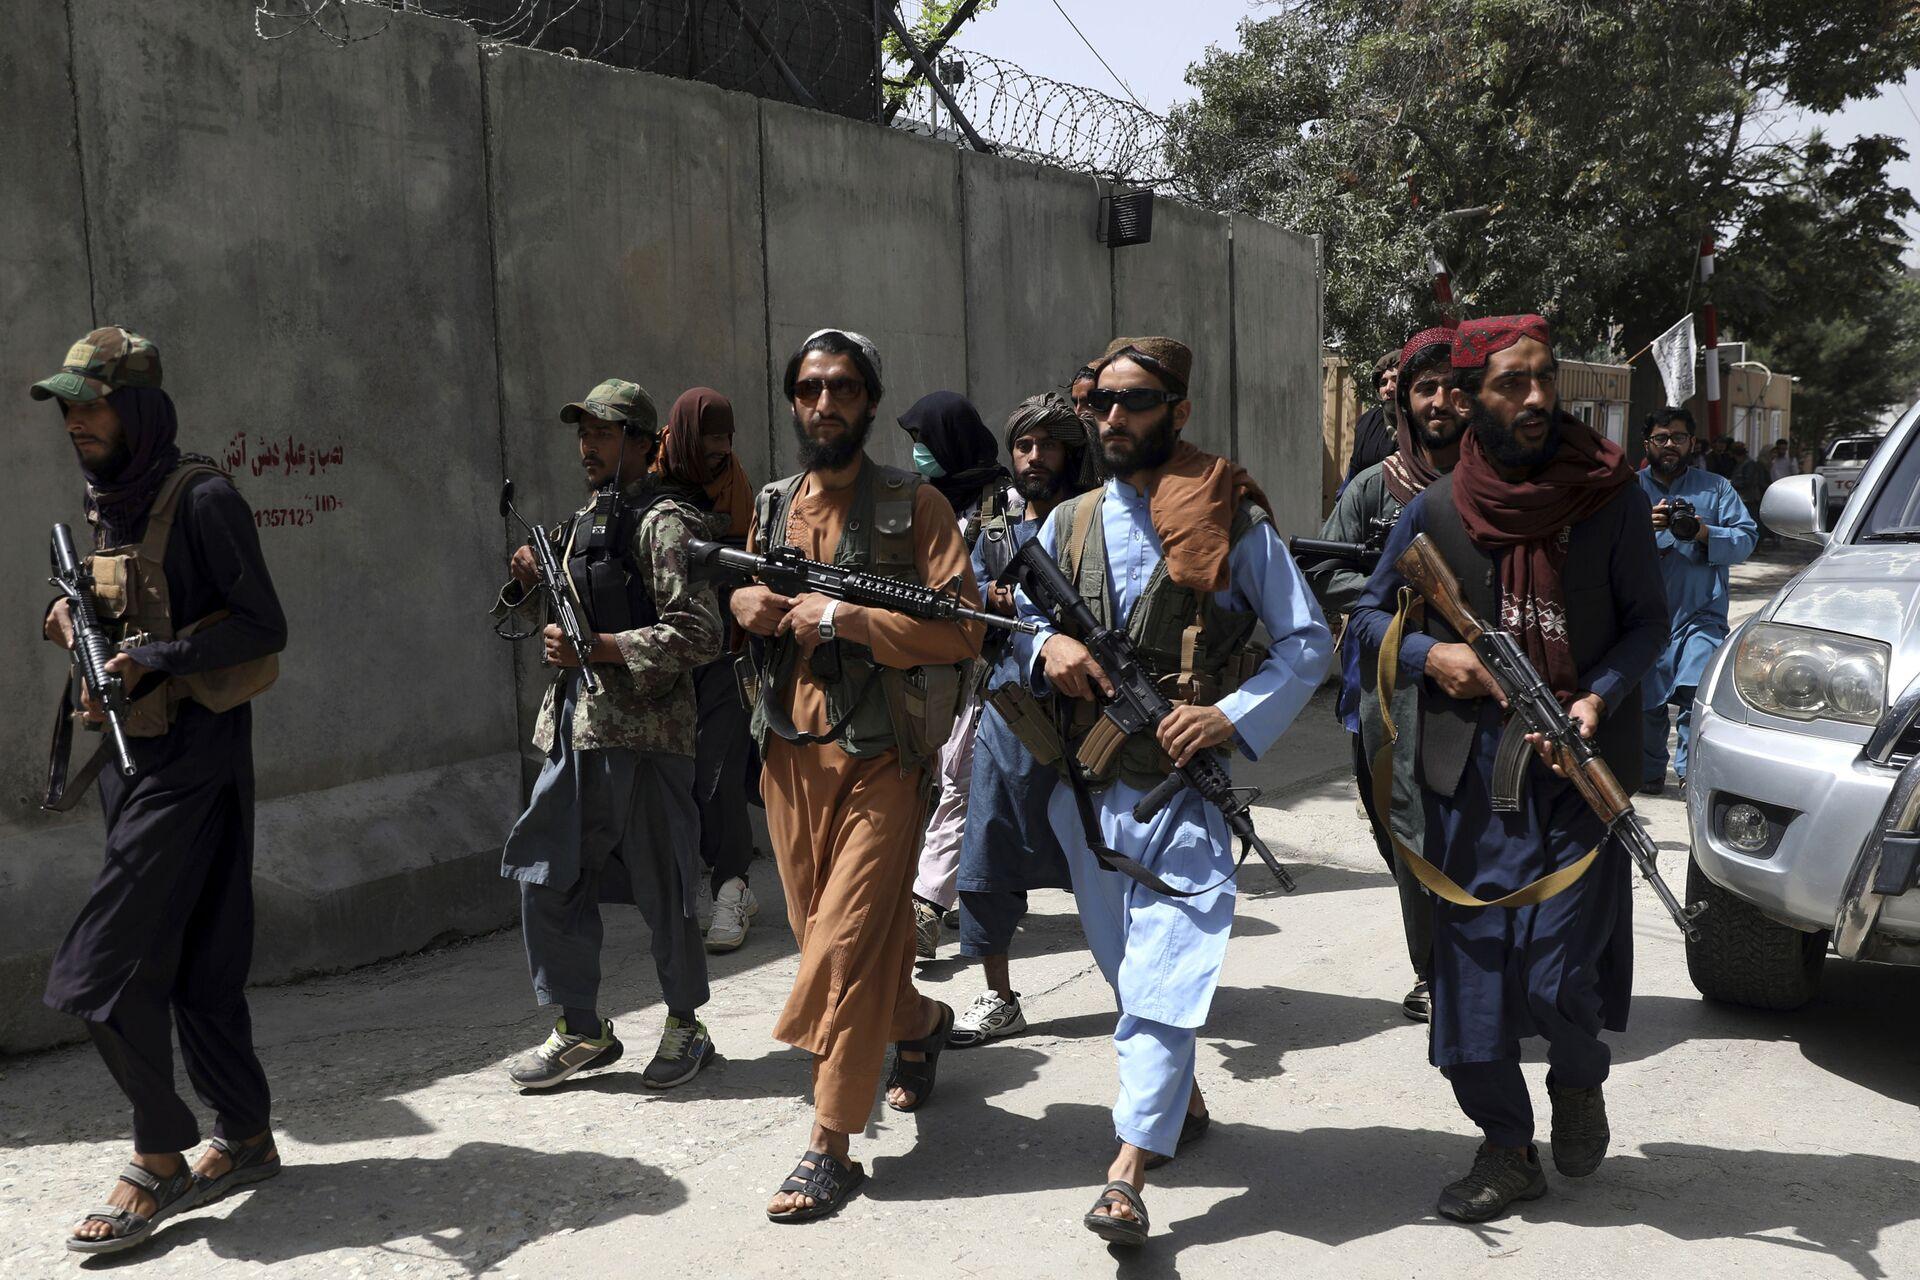 Taliban fighters patrol in Wazir Akbar Khan neighborhood in the city of Kabul, Afghanistan, Wednesday, Aug. 18, 2021. - Sputnik International, 1920, 07.09.2021